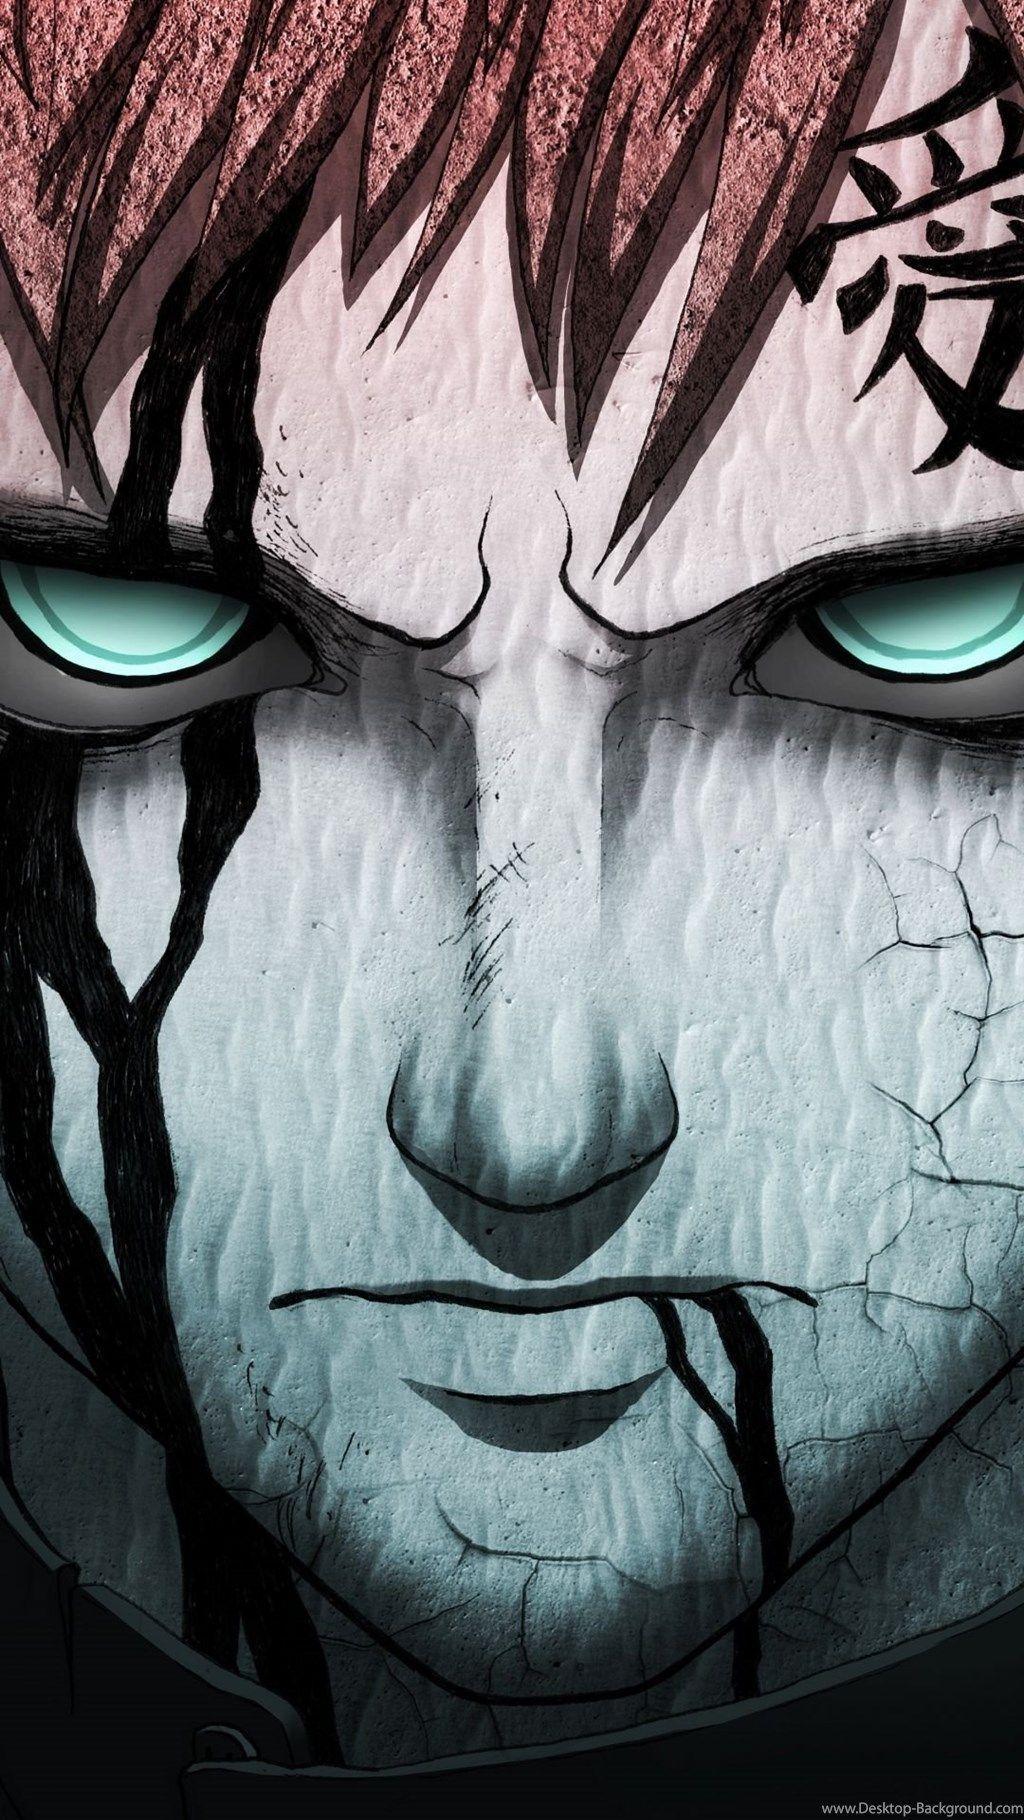 Naruto Anime Iphone Wallpapers Top Free Naruto Anime